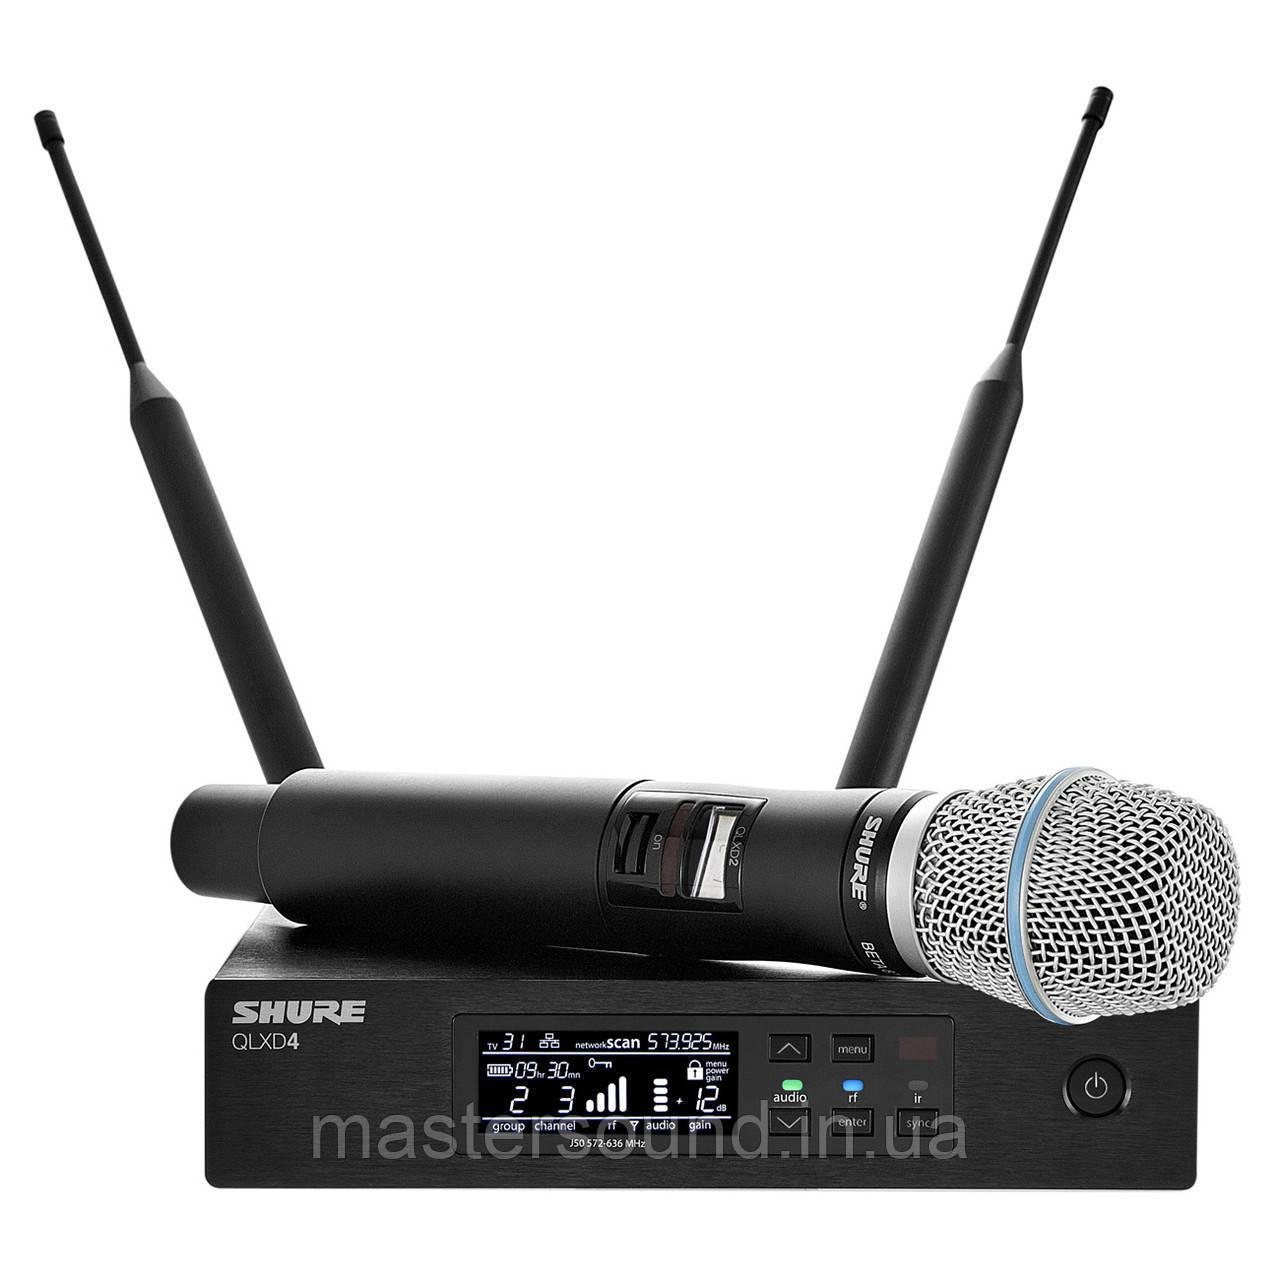 Цифровая радиосистема Shure QLXD24B87A